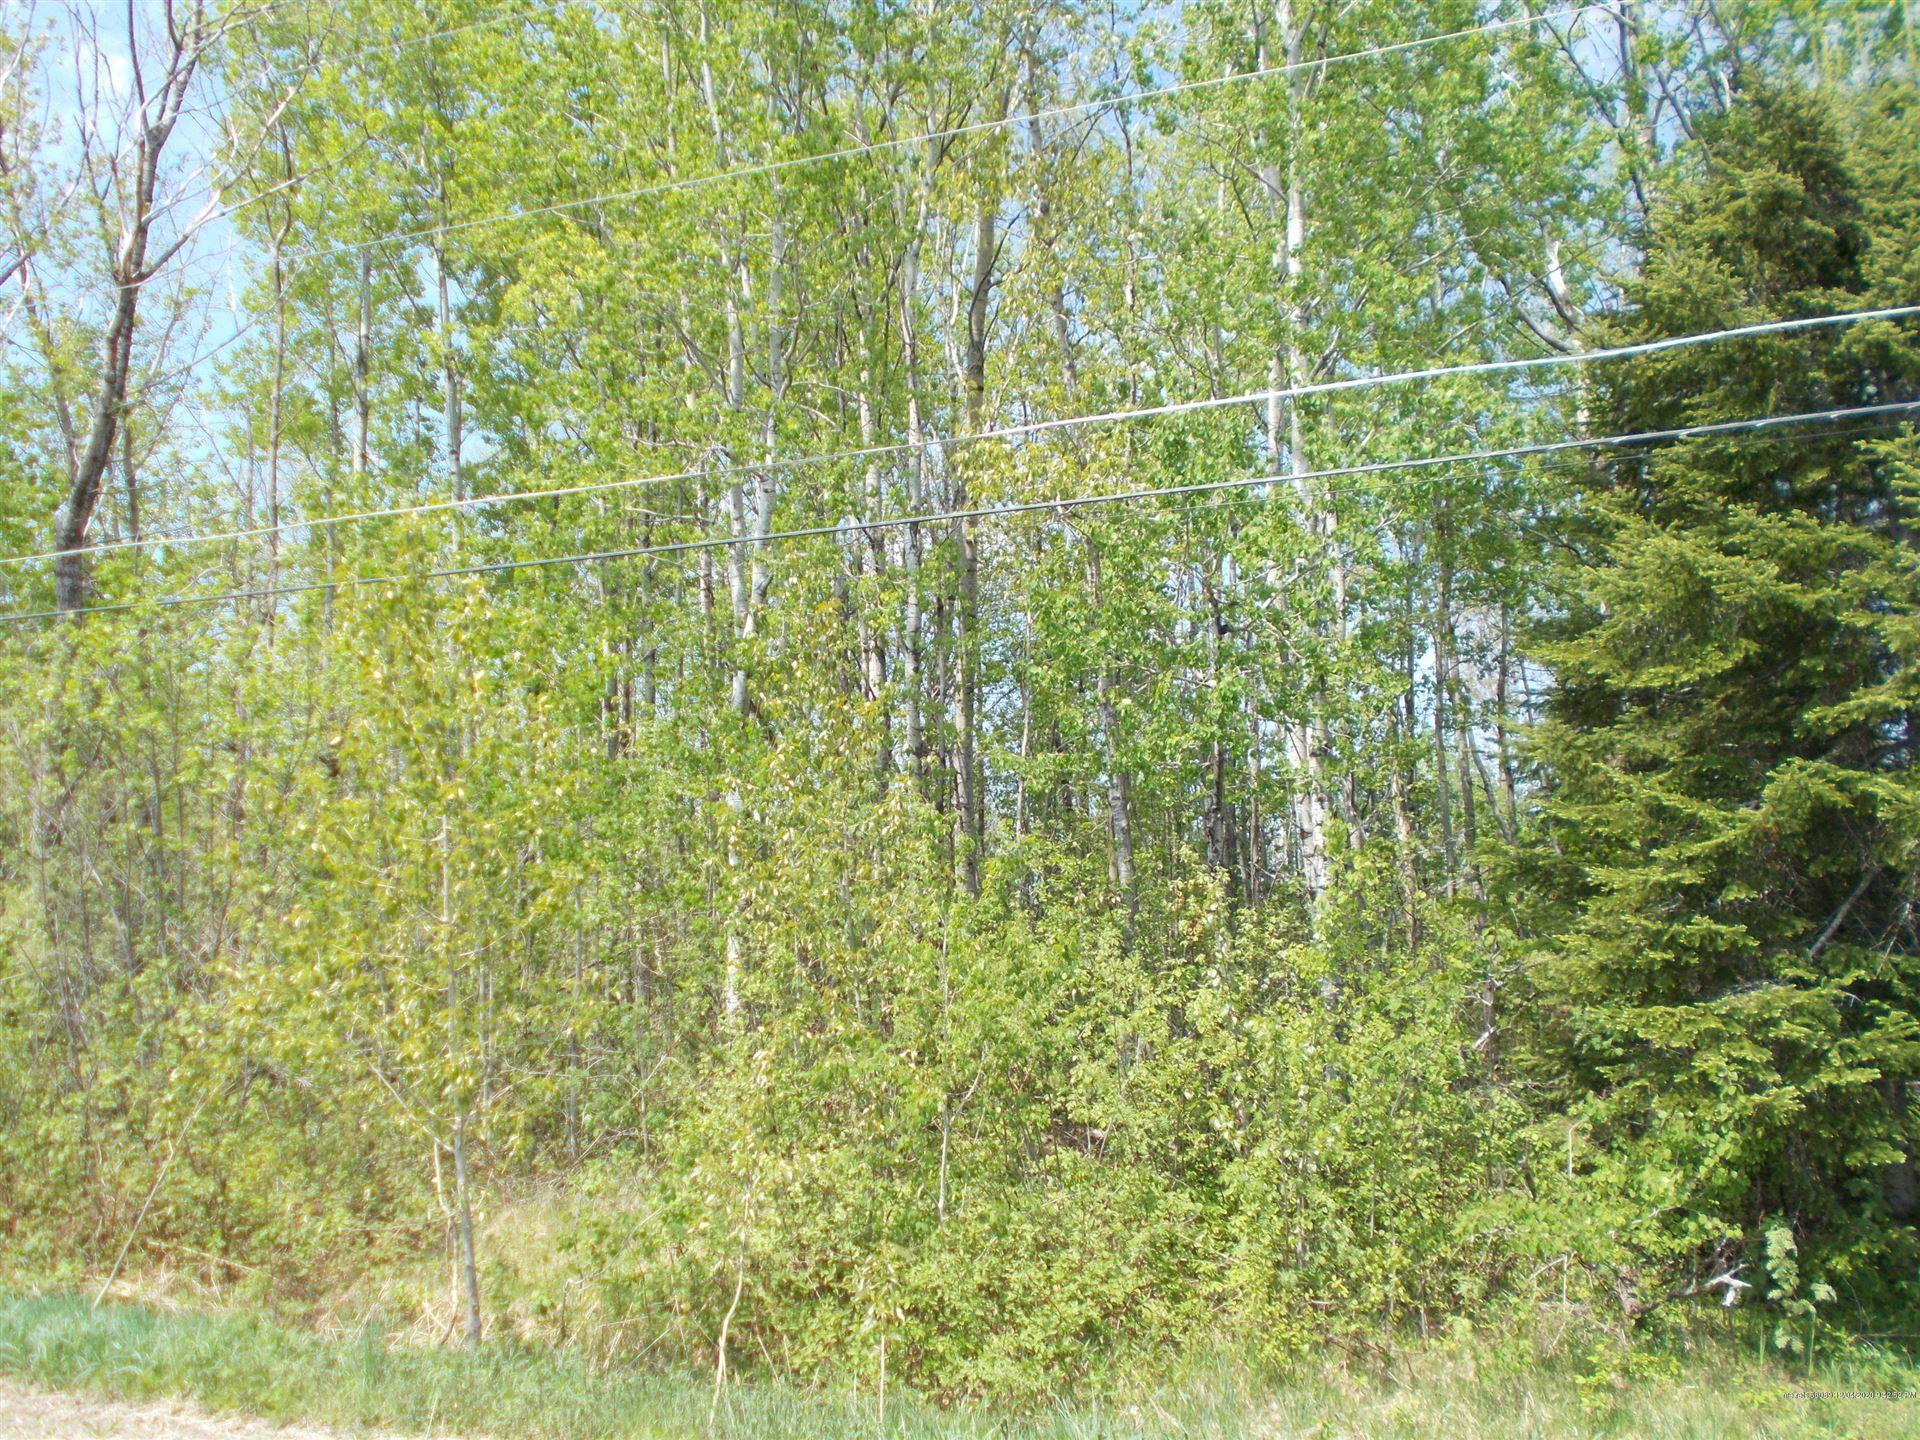 Photo of 0 Corriveau Street, Caribou, ME 04736 (MLS # 1477495)